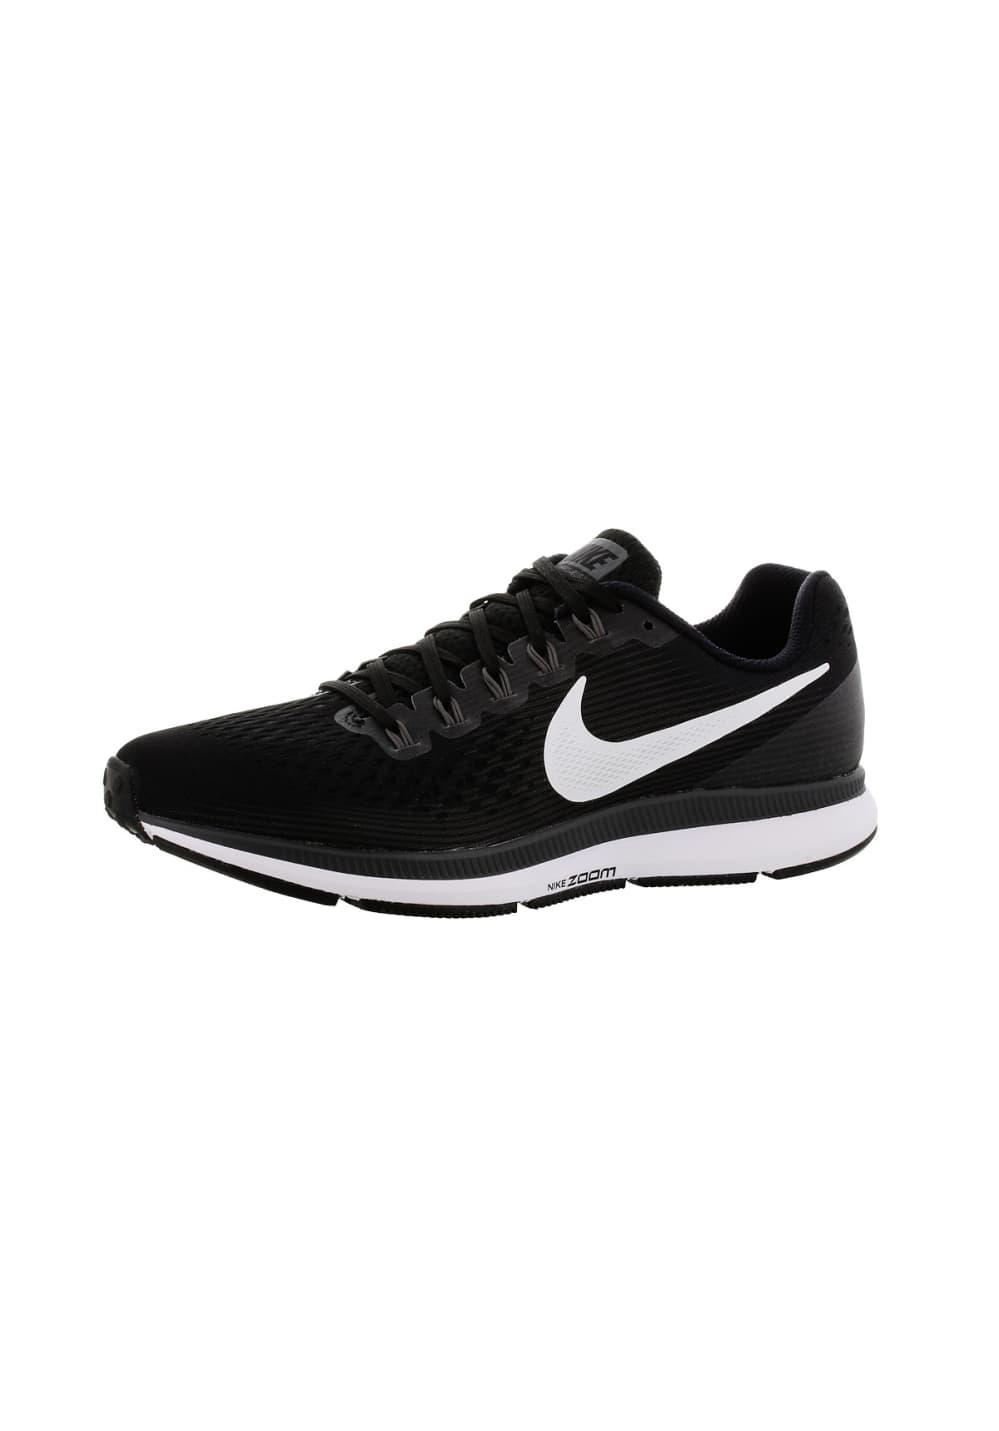 best service 4f2cf df300 Next. -60%. Nike. Air Zoom Pegasus 34 - Running shoes ...